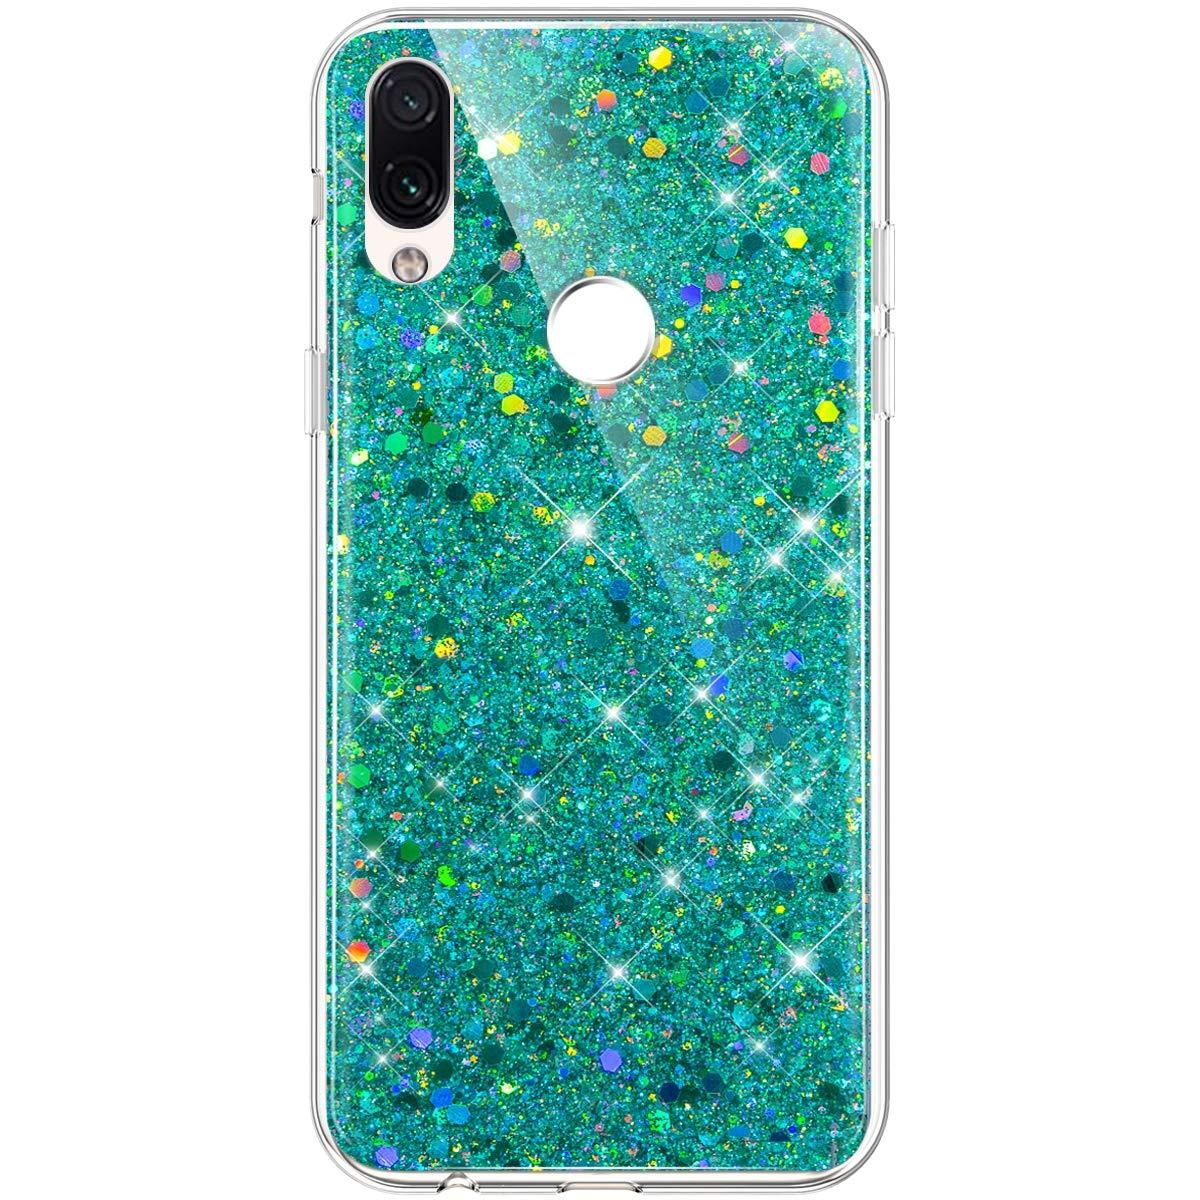 Coque Silicone avec Paillette Glitter Bumper Housse Etui de Protection Anti Choc Ultra Slim Premium TPU Coque pour pour Xiaomi Redmi Note 7-Bleu SainCat Coque pour Xiaomi Redmi Note 7